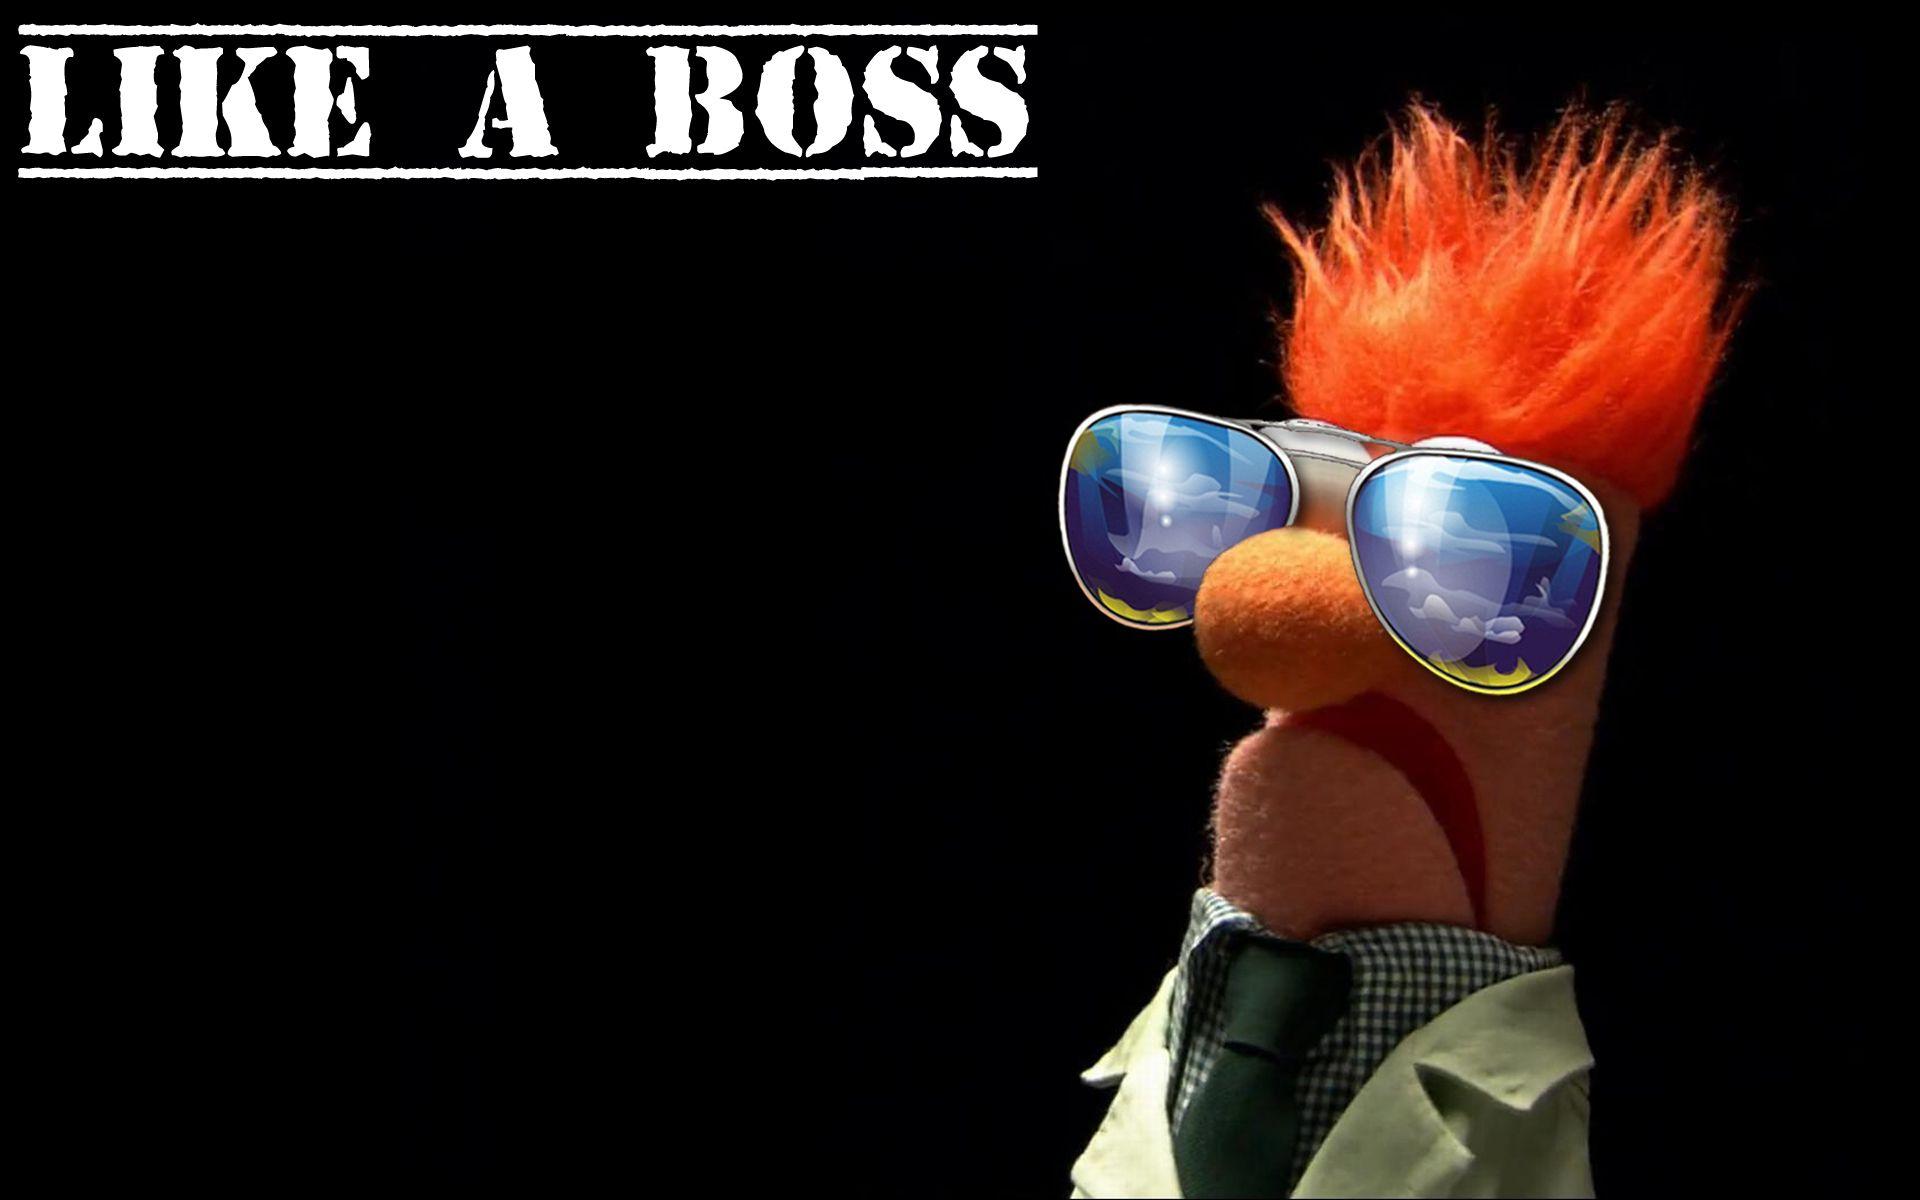 Beaker the muppet show like a boss wallpaper background